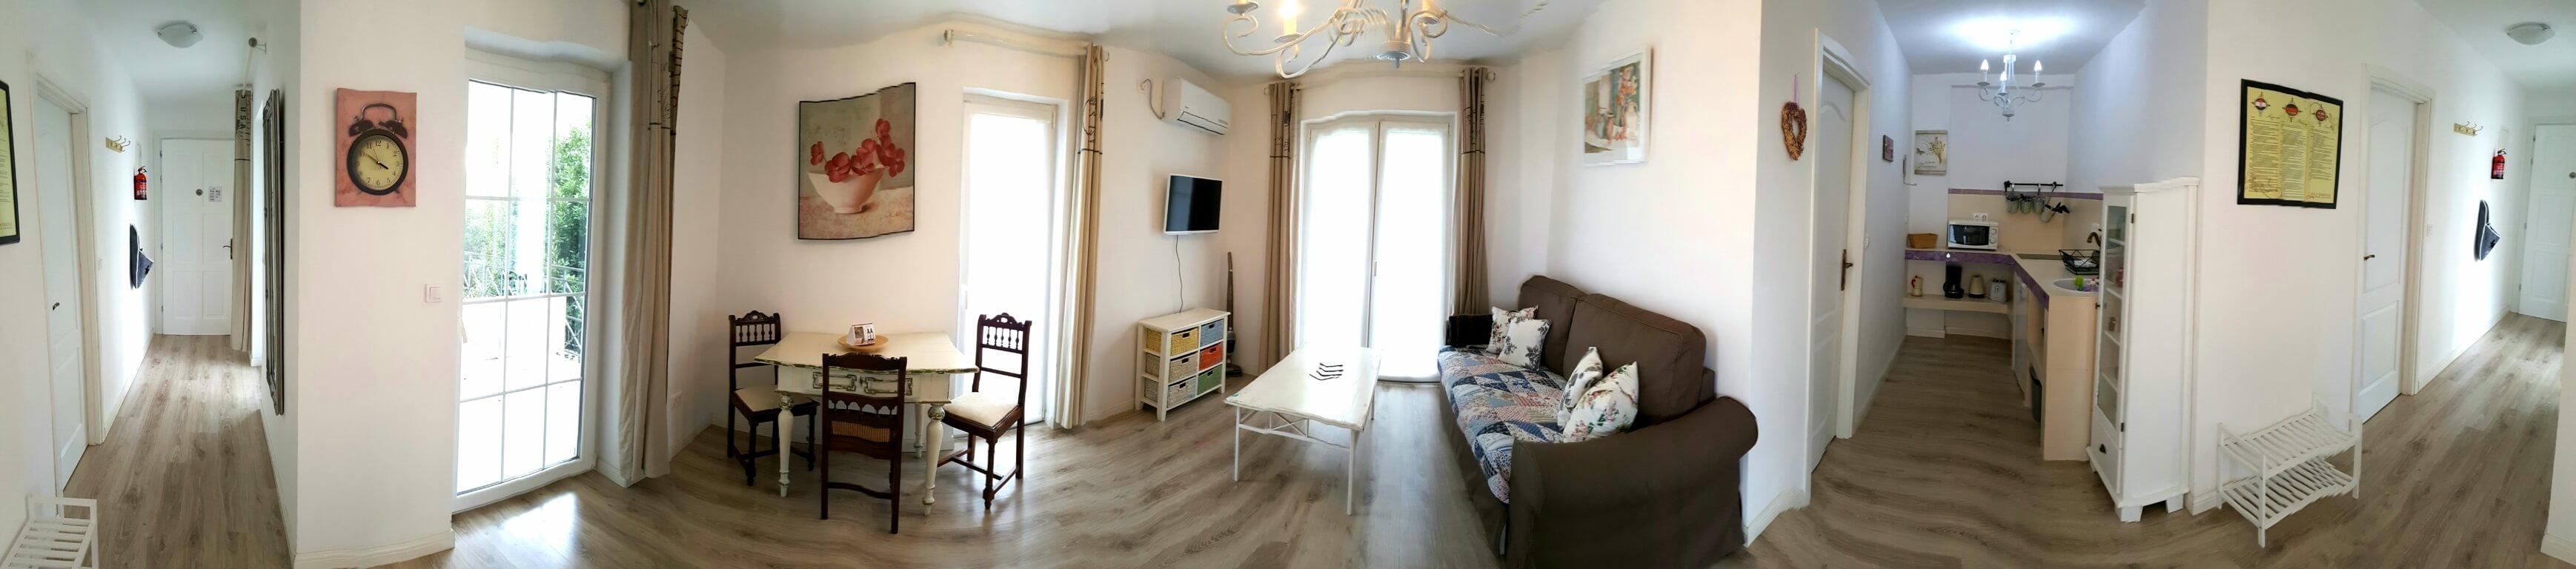 Apartment Agava Panorama Wohn&Essbereich&Kuche